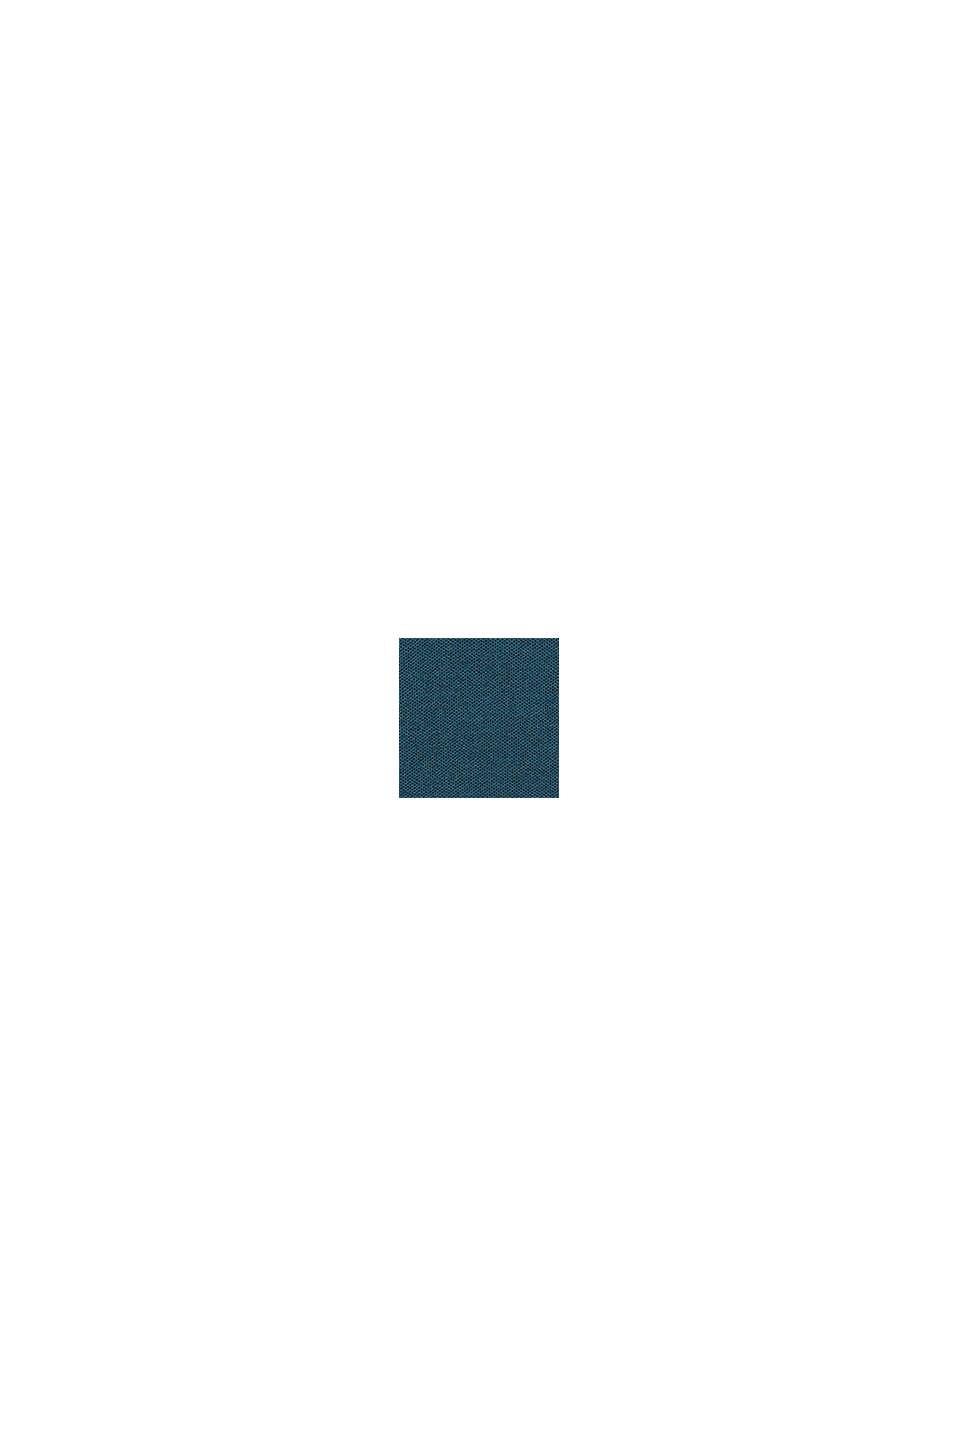 Jersey en 100% algodón ecológico, TEAL BLUE, swatch